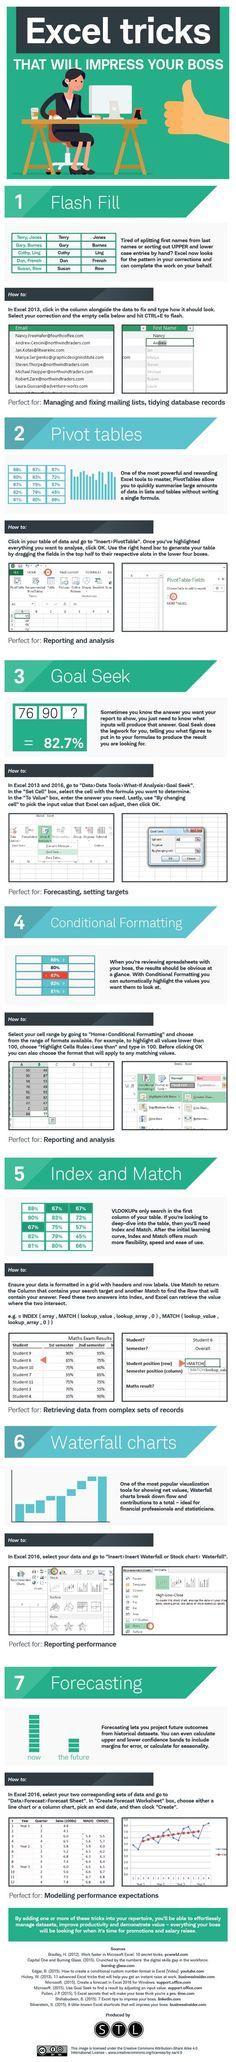 Beliebt Basic Excel Formulas Cheat Sheet | Excel Cheat Sheet - Download  DM38